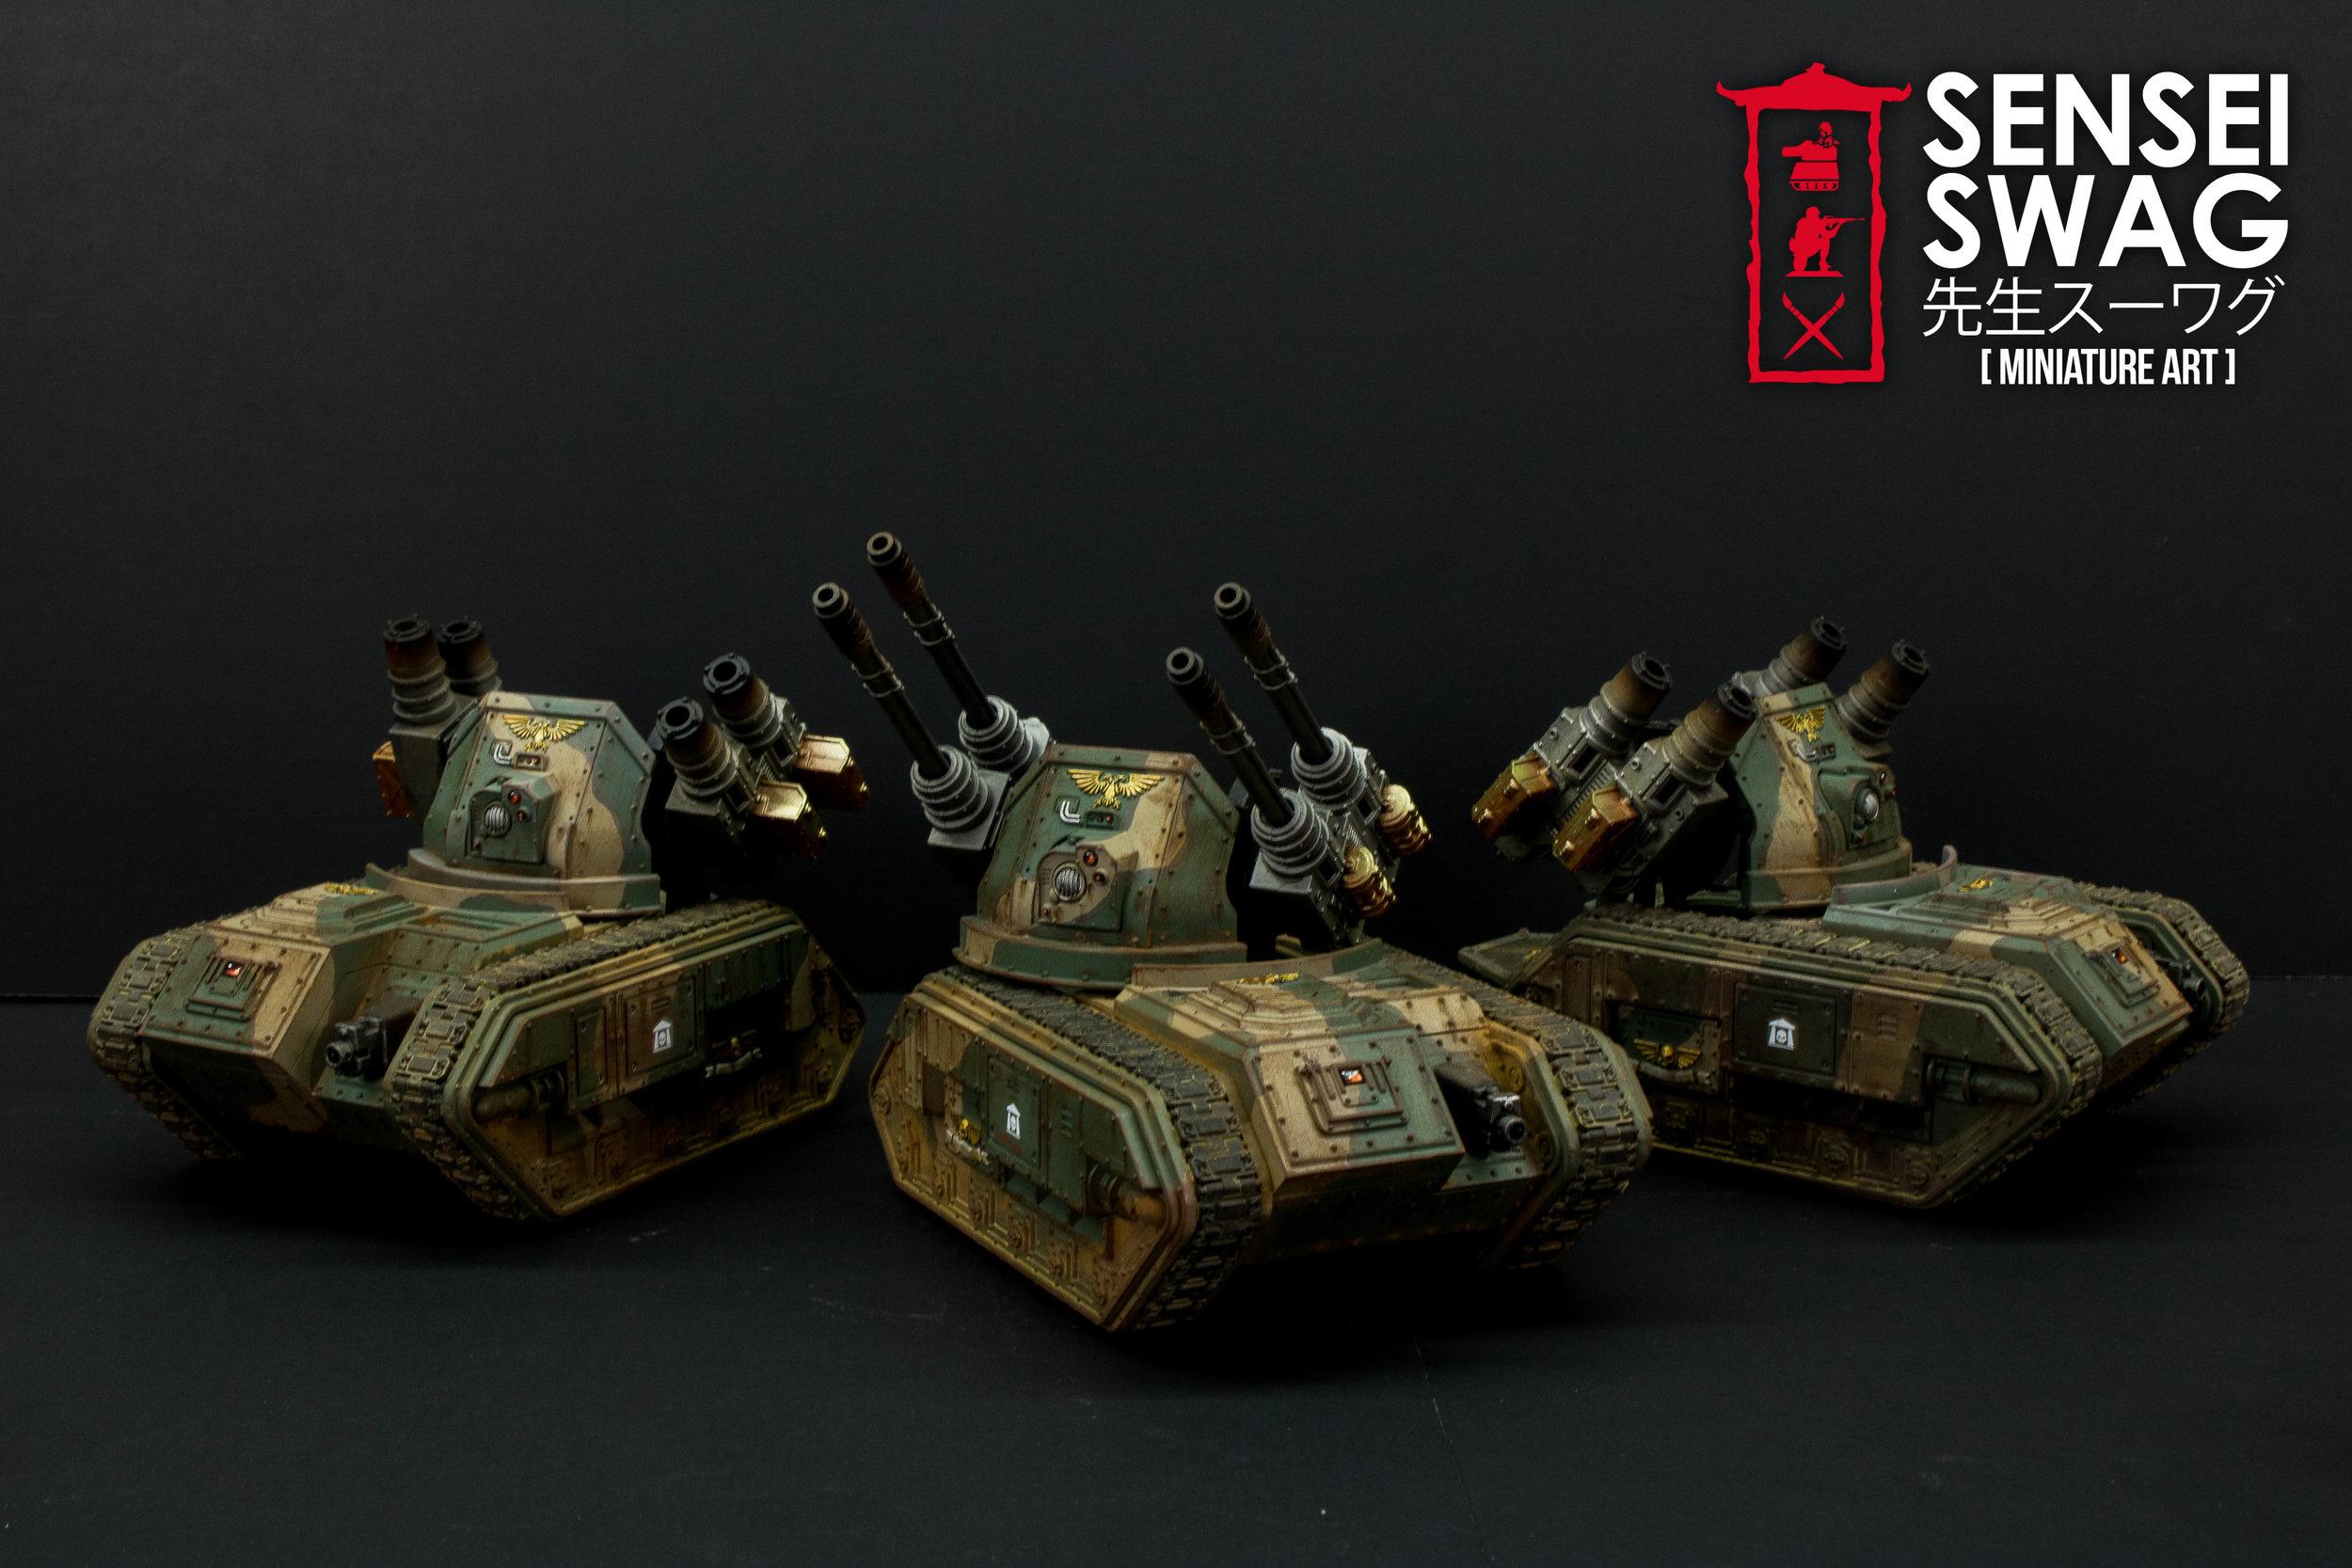 Cadian Armored Company Leman Russ 40k Tanks-6.jpg